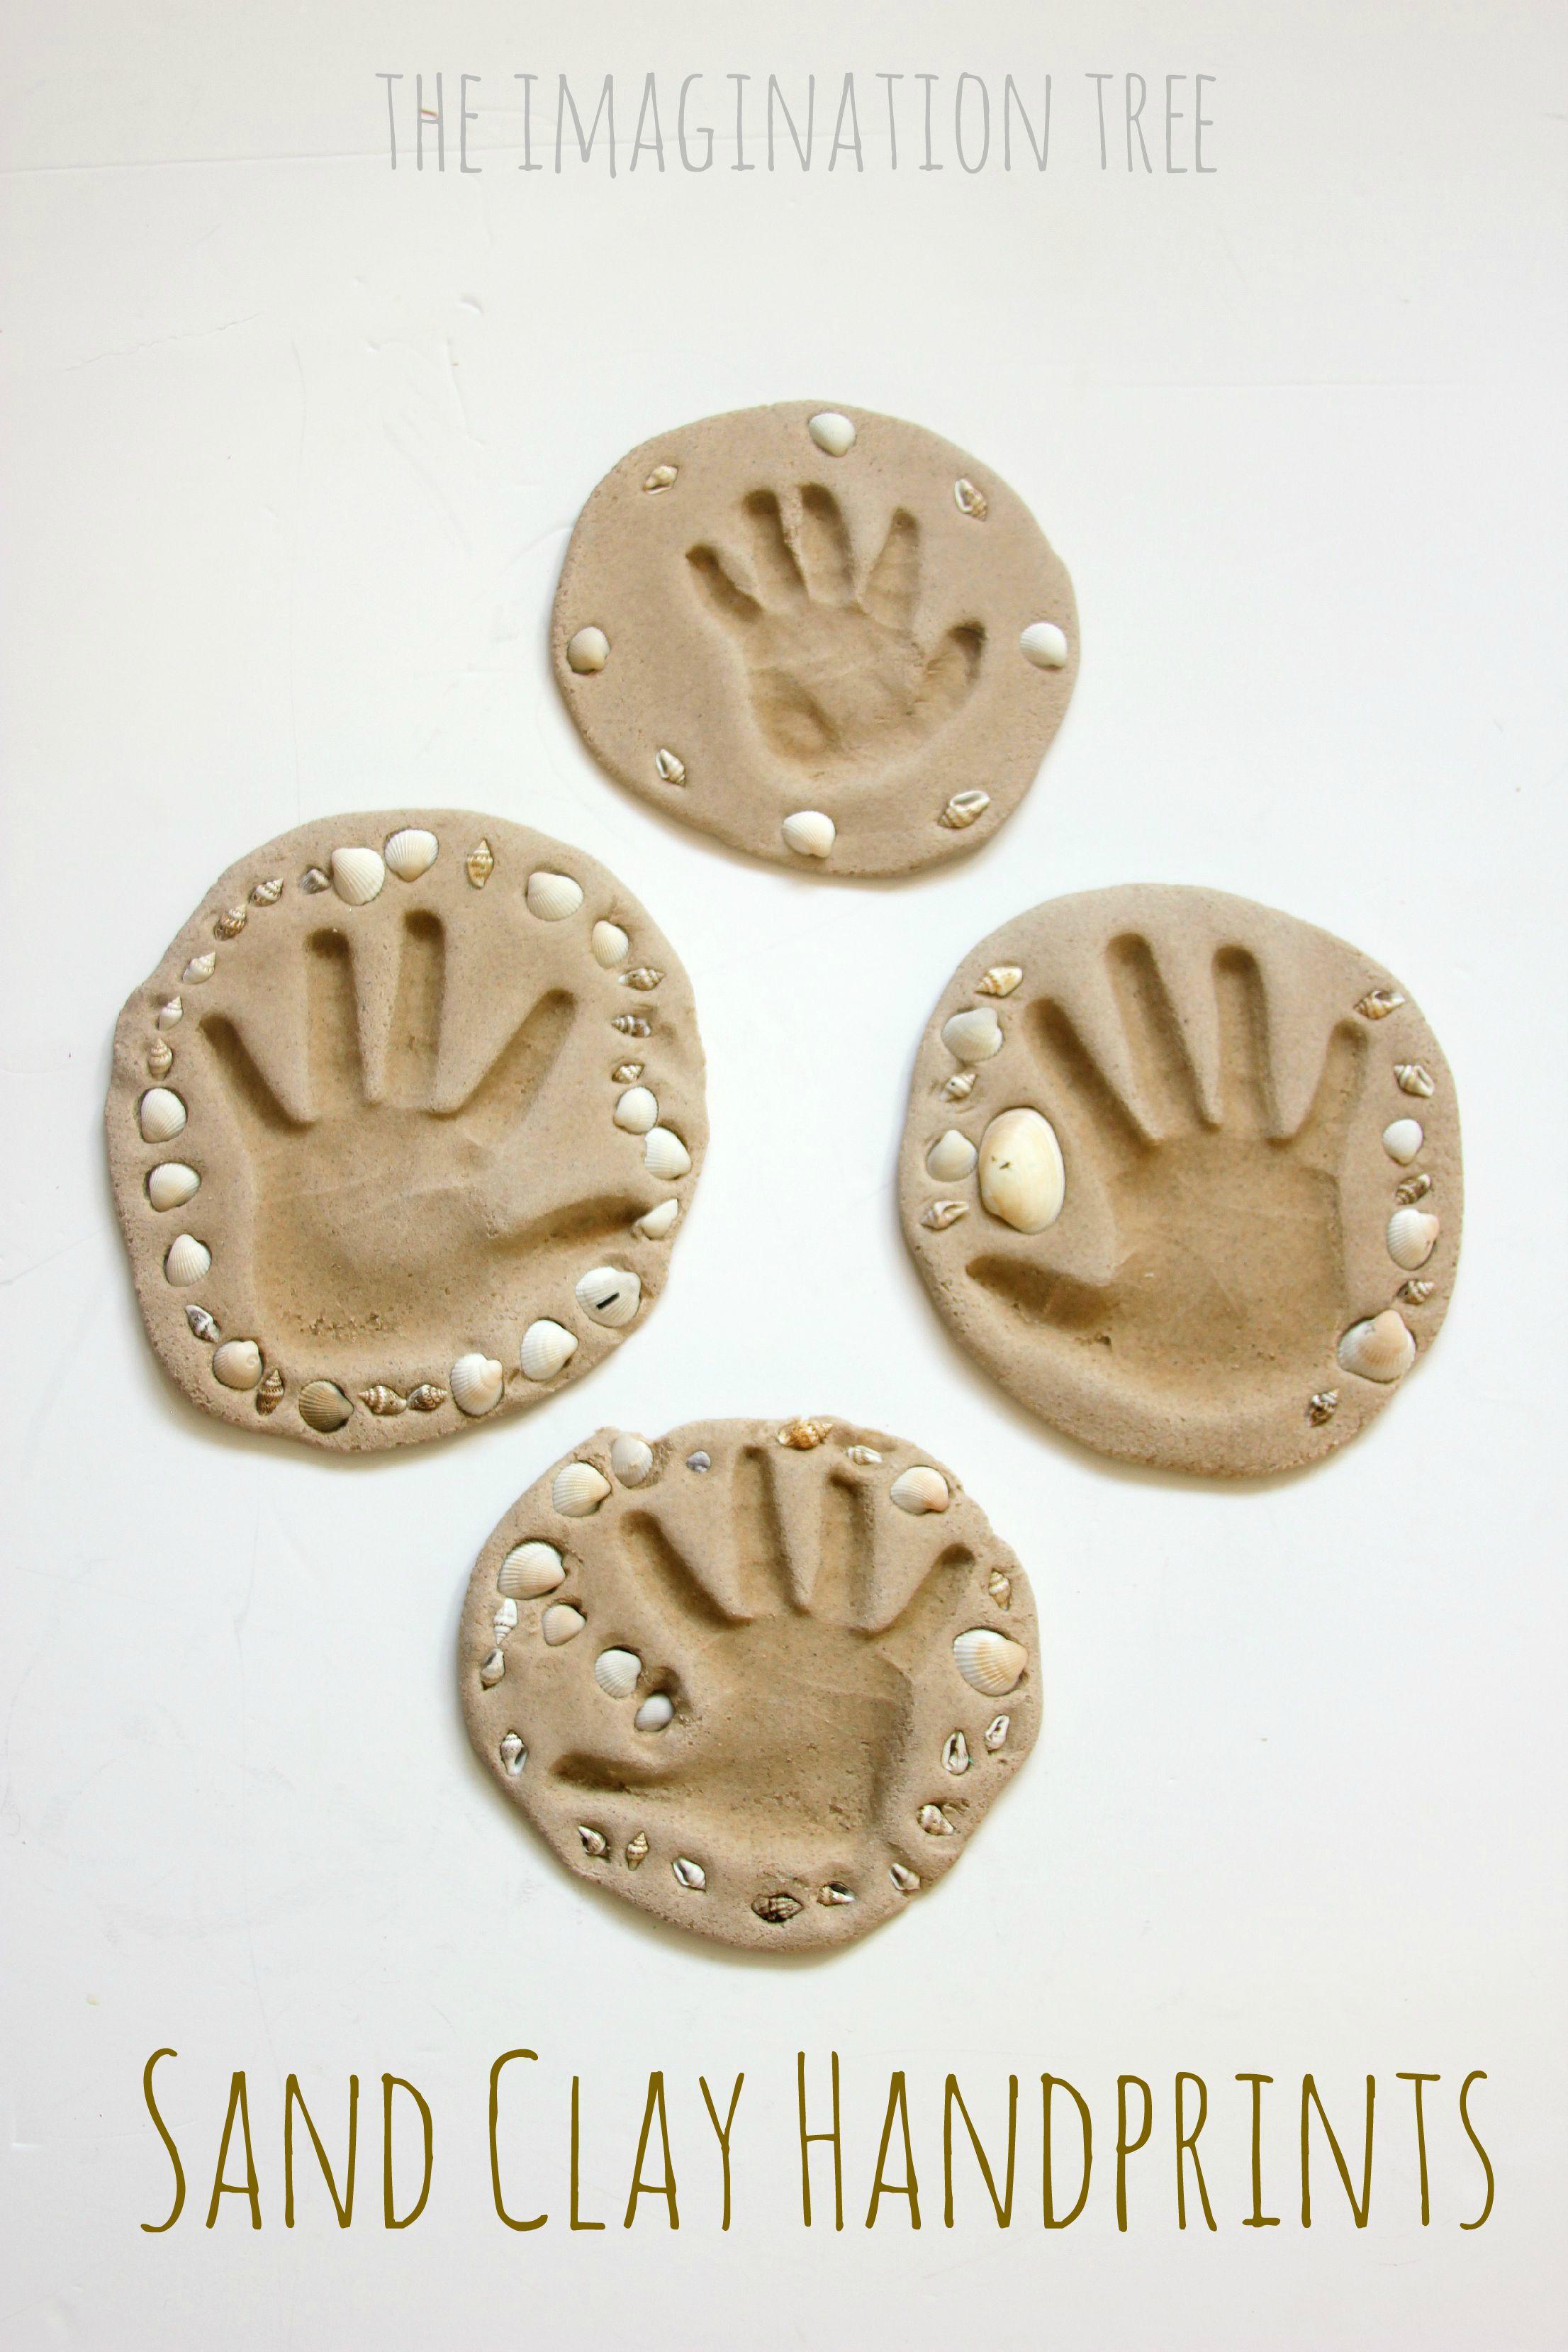 Homemade Clay Handprint Craft